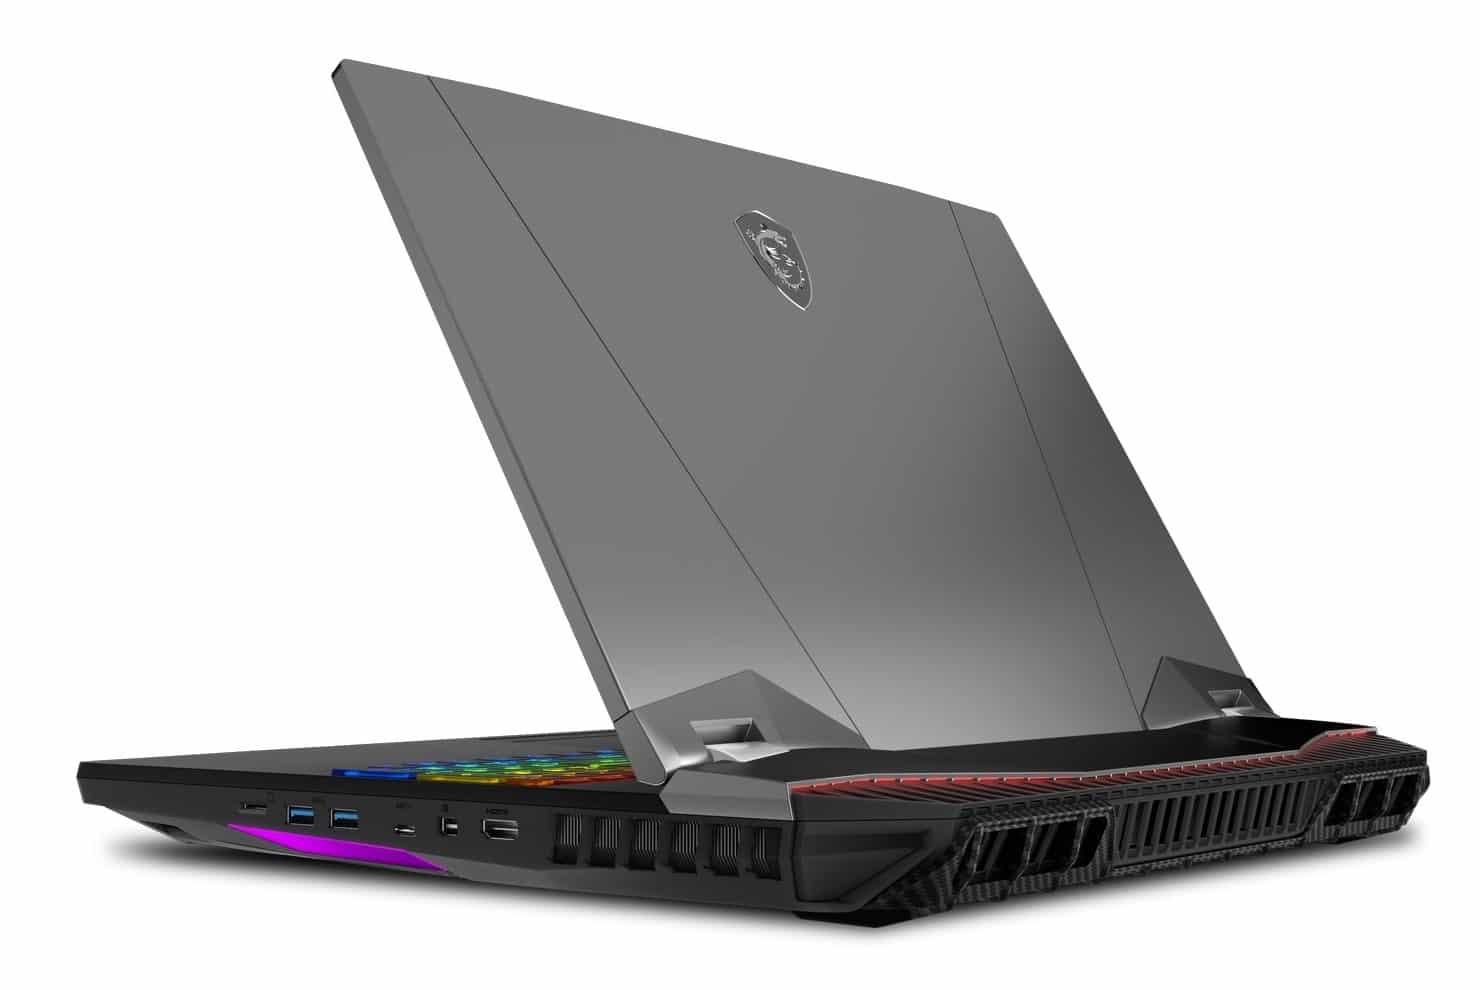 "<span class=""tagtitre"">Computex 2019 - </span>MSI GT76 Titan, 17"" gamer massif i9 8 cœurs RTX 2080"